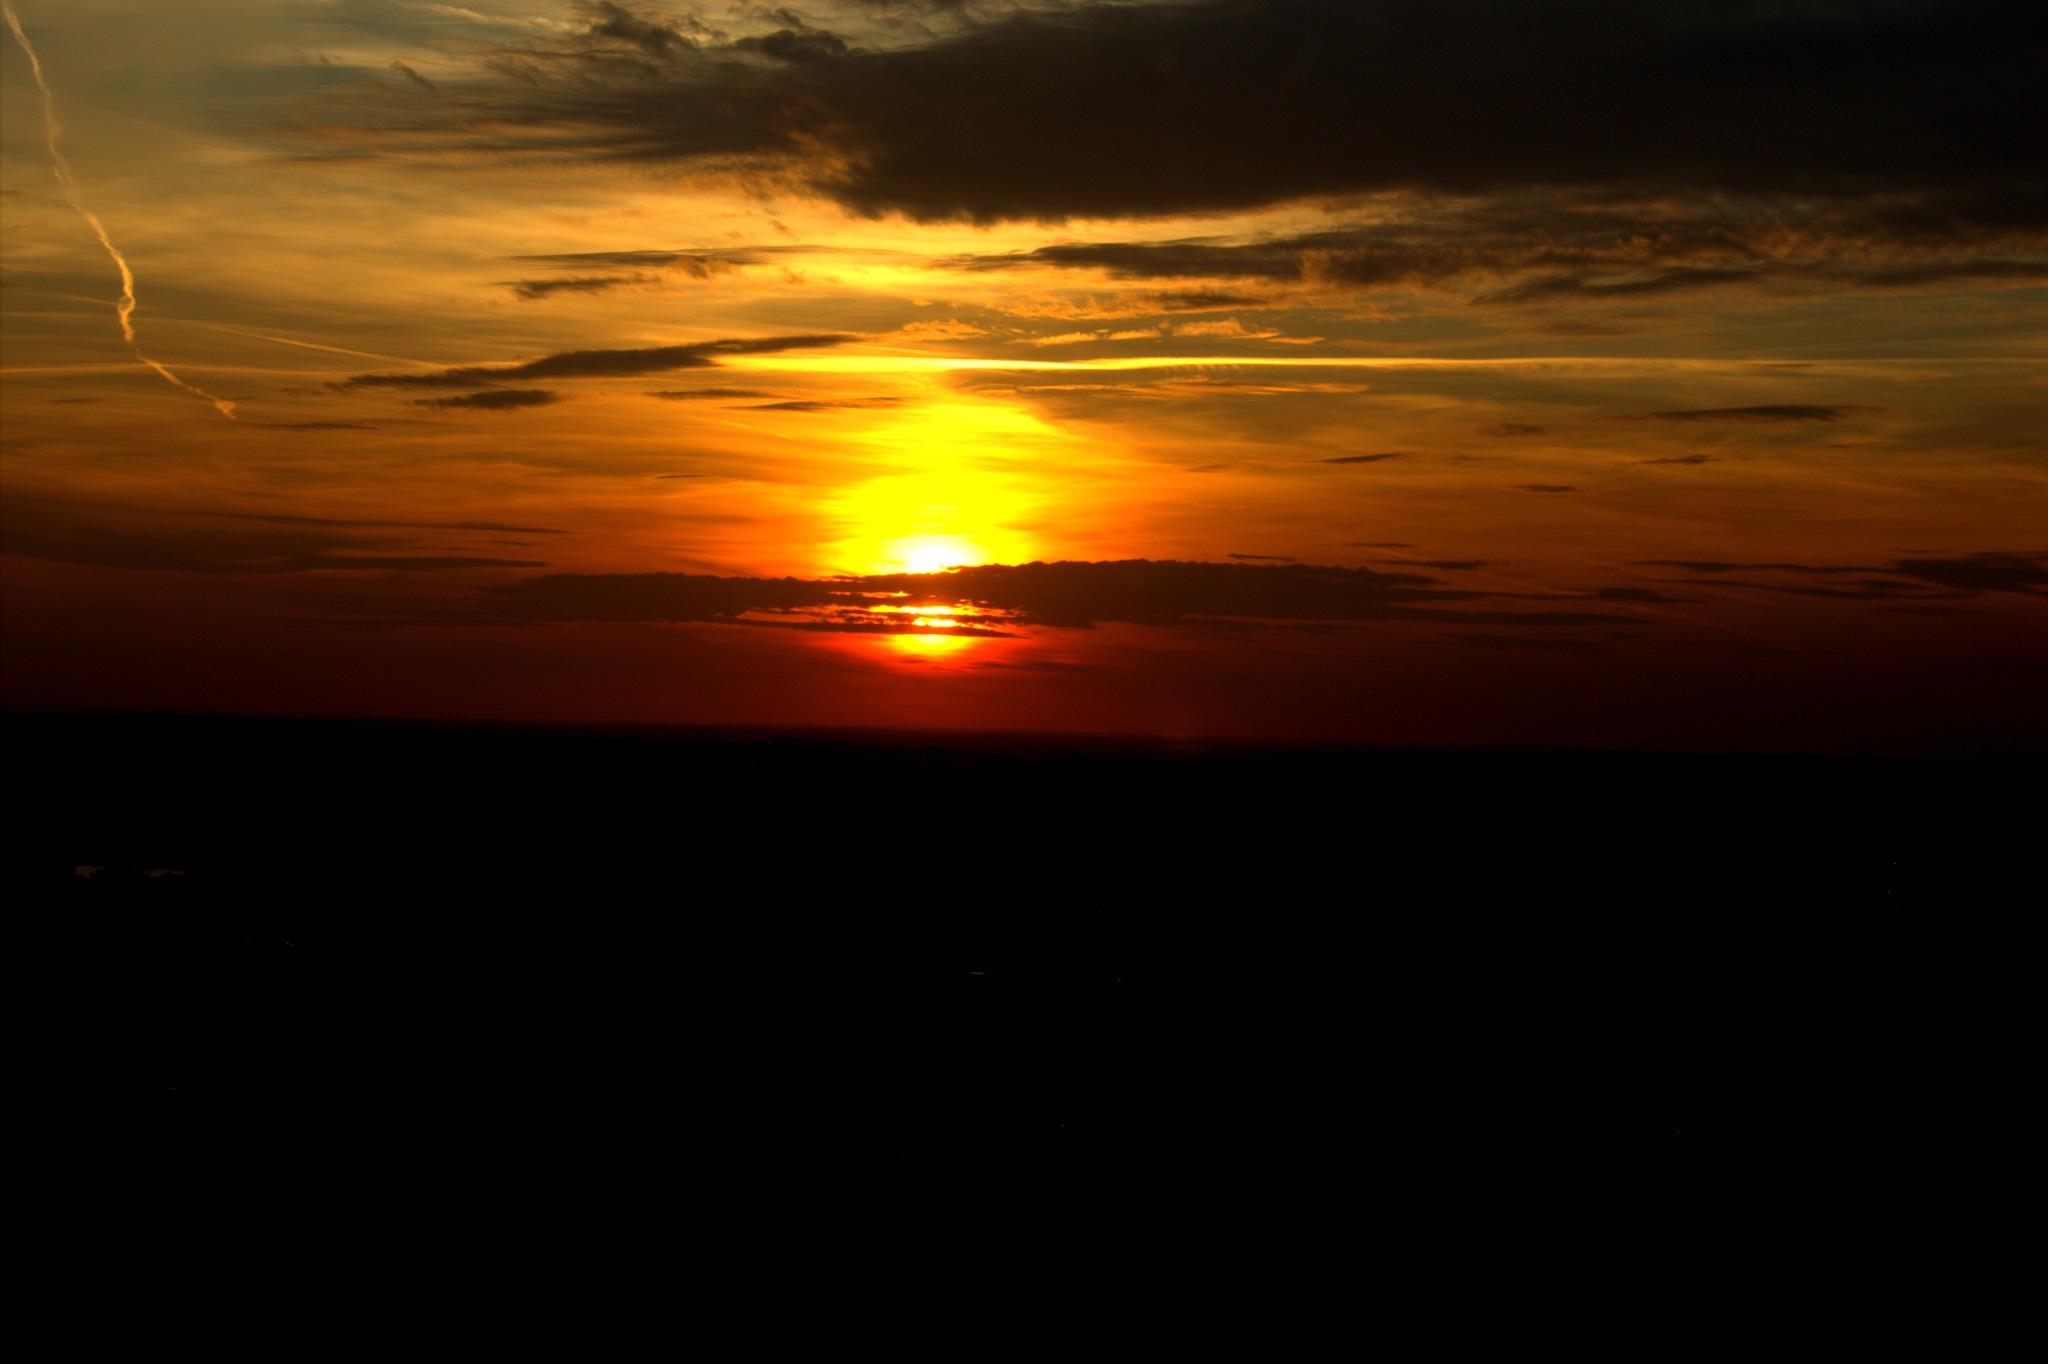 sunset by Sudhir Saraf